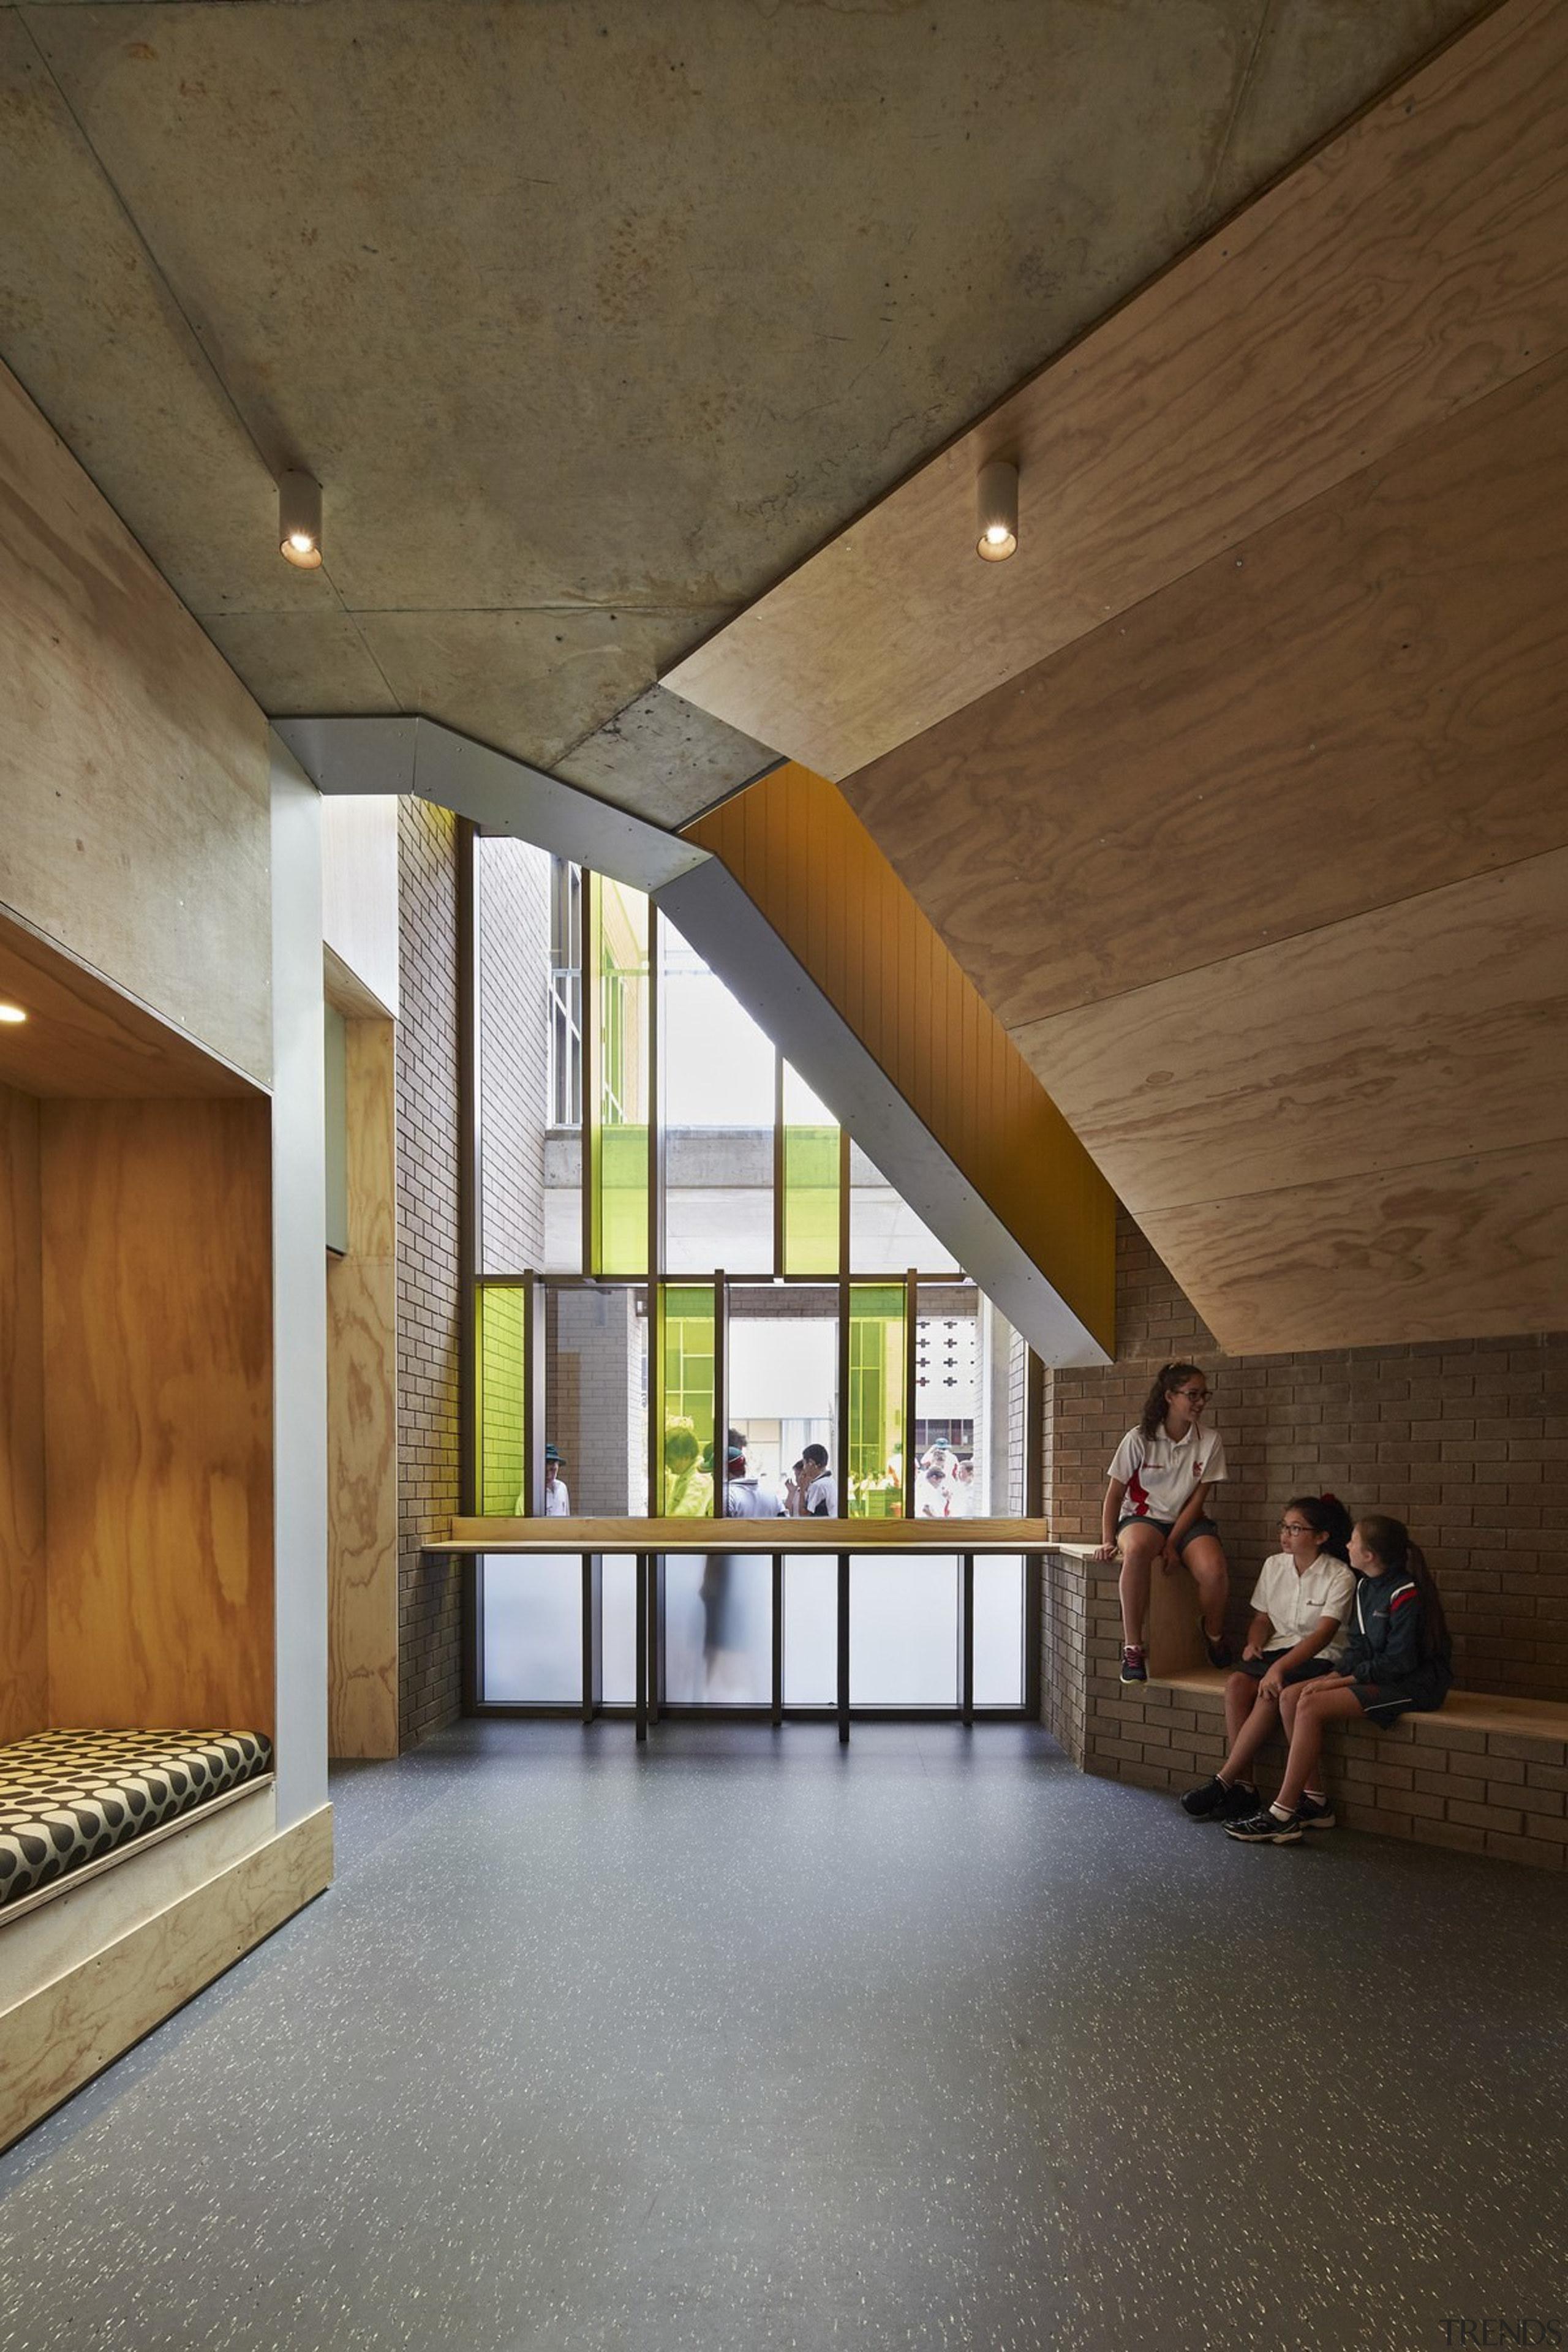 Bunbury Catholic College – Mercy Campus - Bunbury architecture, ceiling, daylighting, floor, house, interior design, lobby, wood, brown, gray